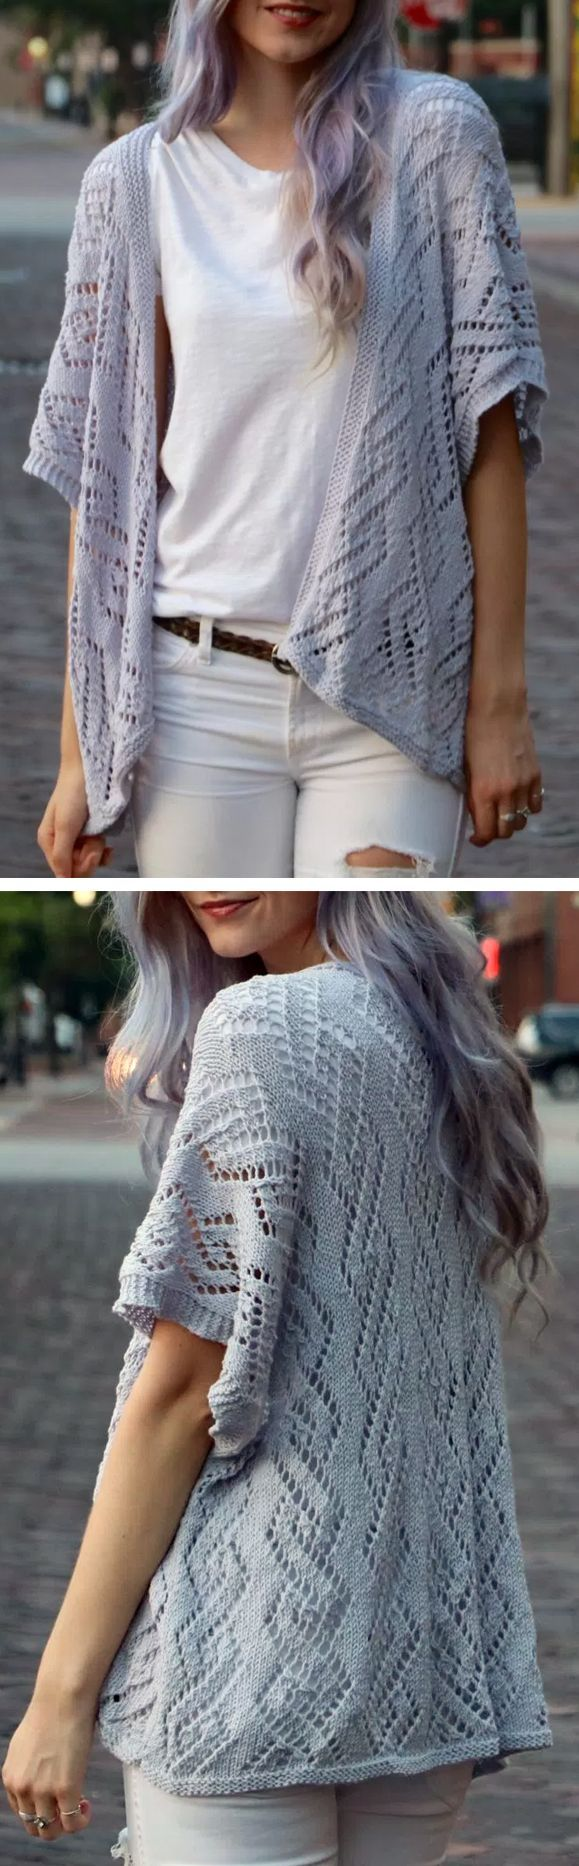 Lace Kimono Knitting Pattern : Best 25+ Knit cardigan pattern ideas on Pinterest Knit shrug, Shrug knittin...